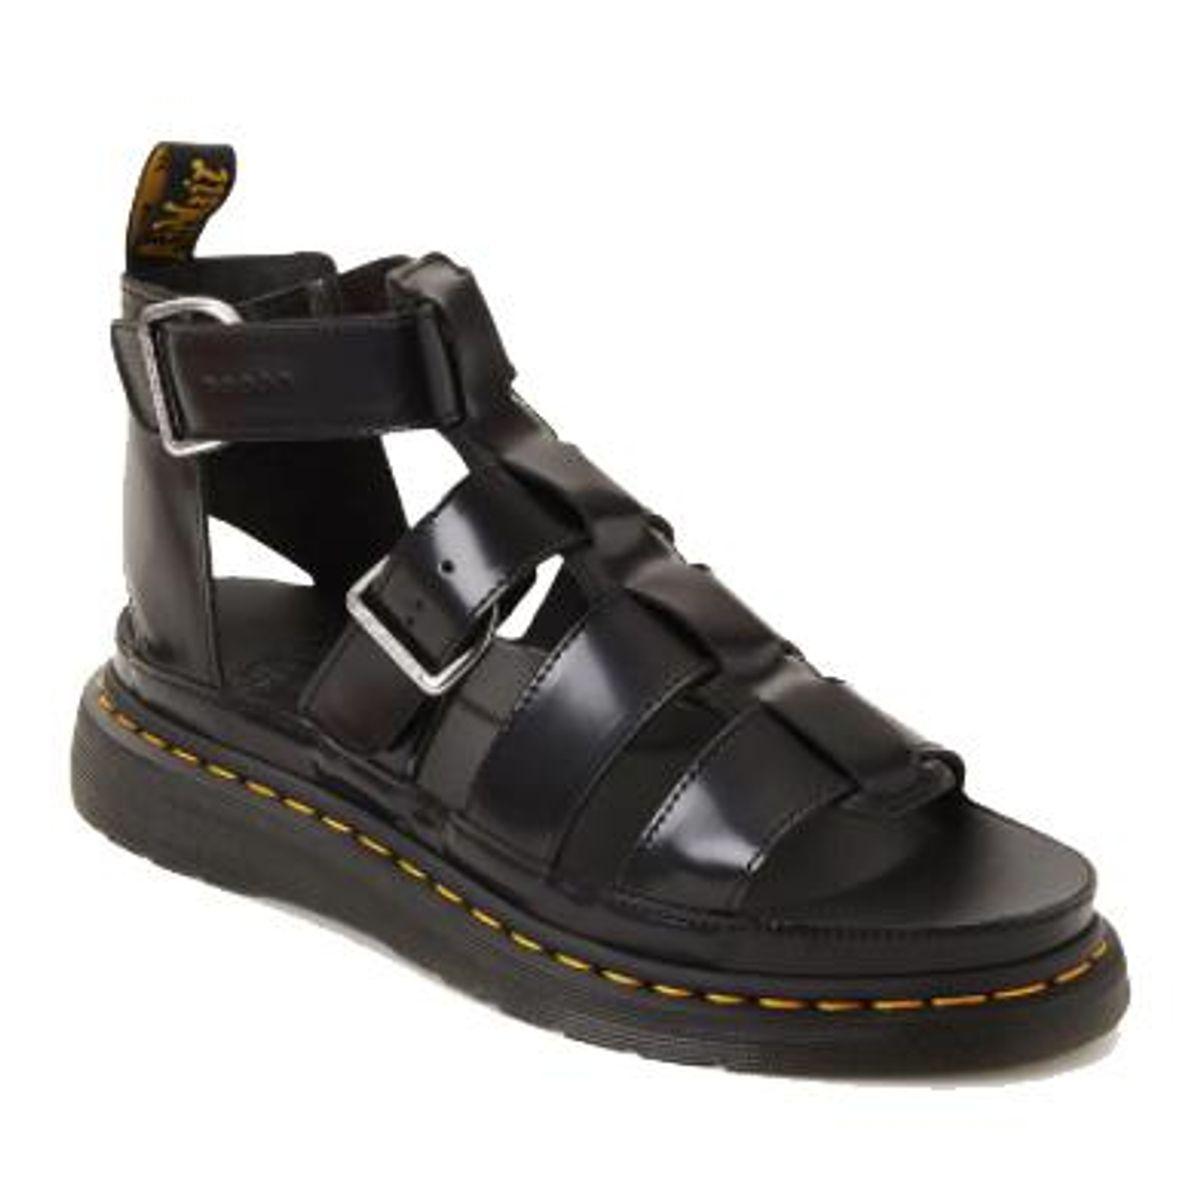 dr martens mackaye leather strap sandals